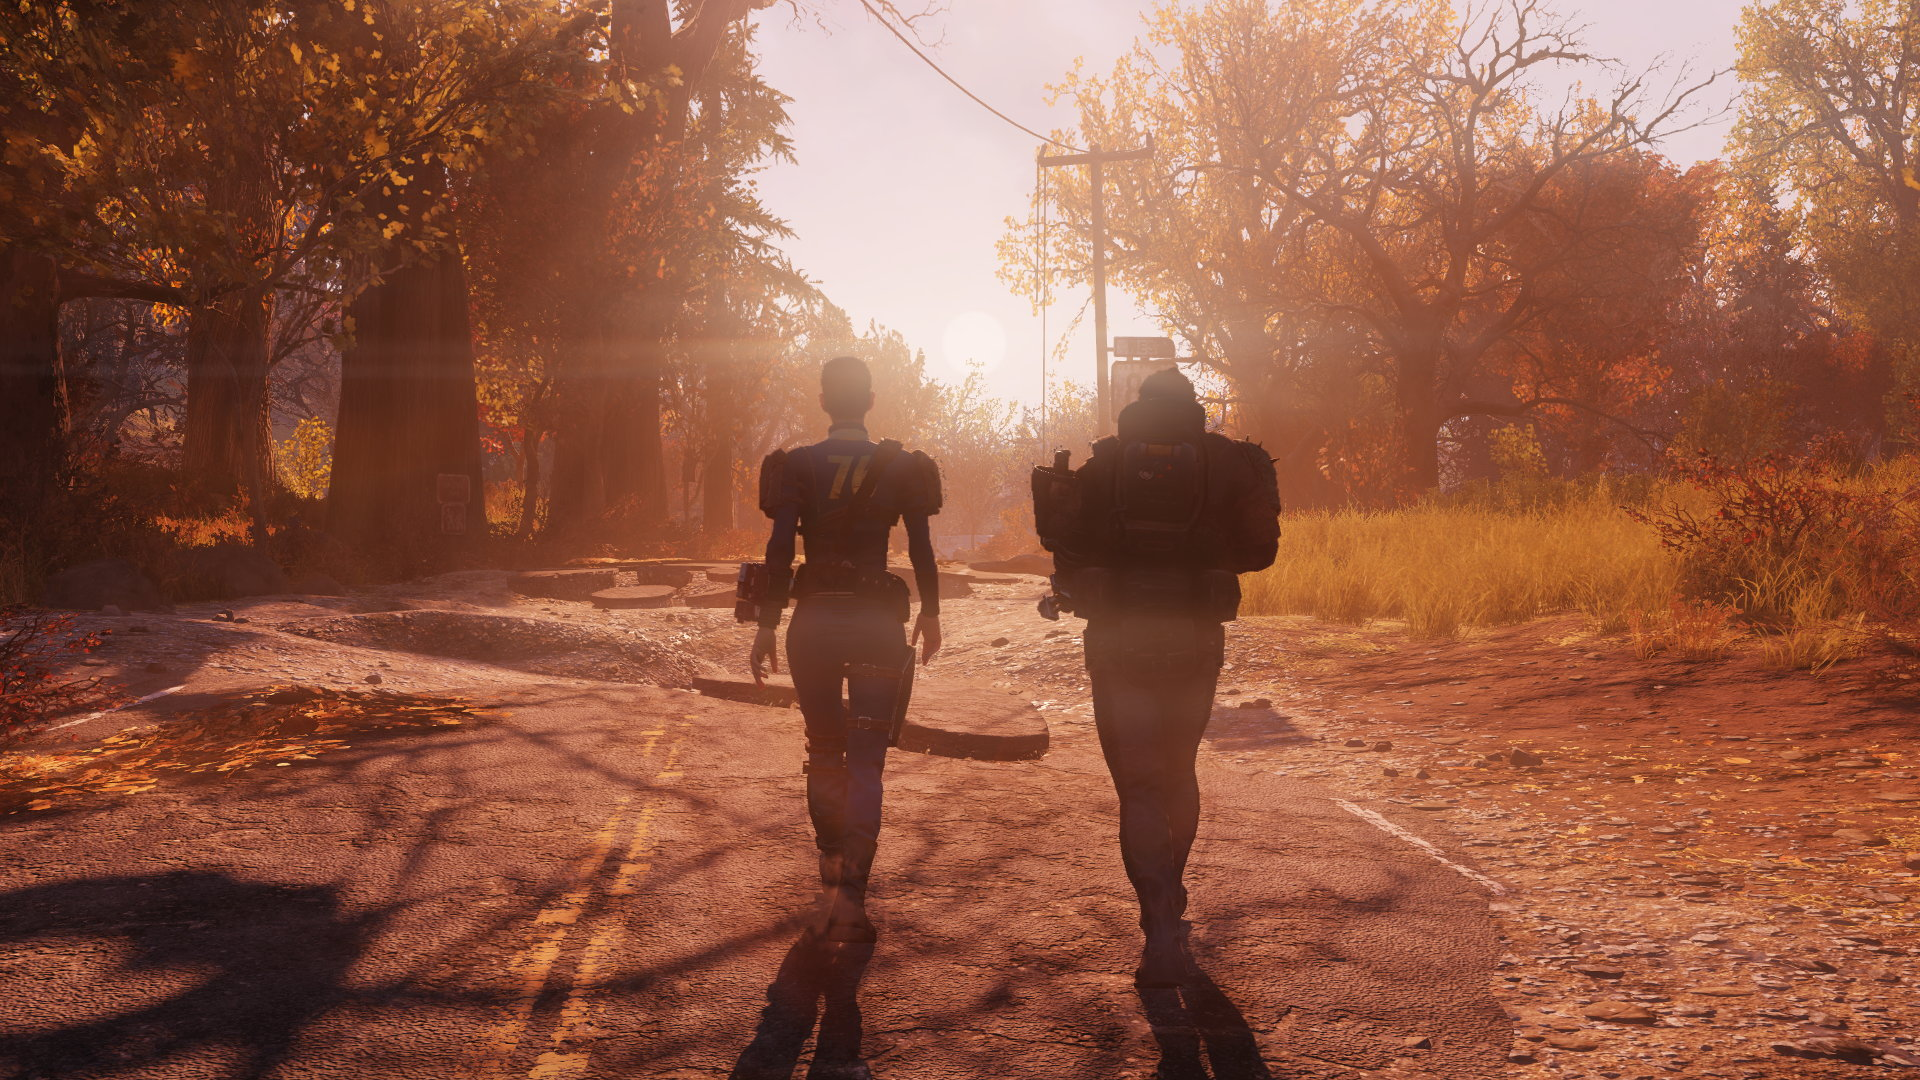 Fallout 76 Beta Finding Life And Mothmans Butt In The Wilderness Rock Paper Shotgun